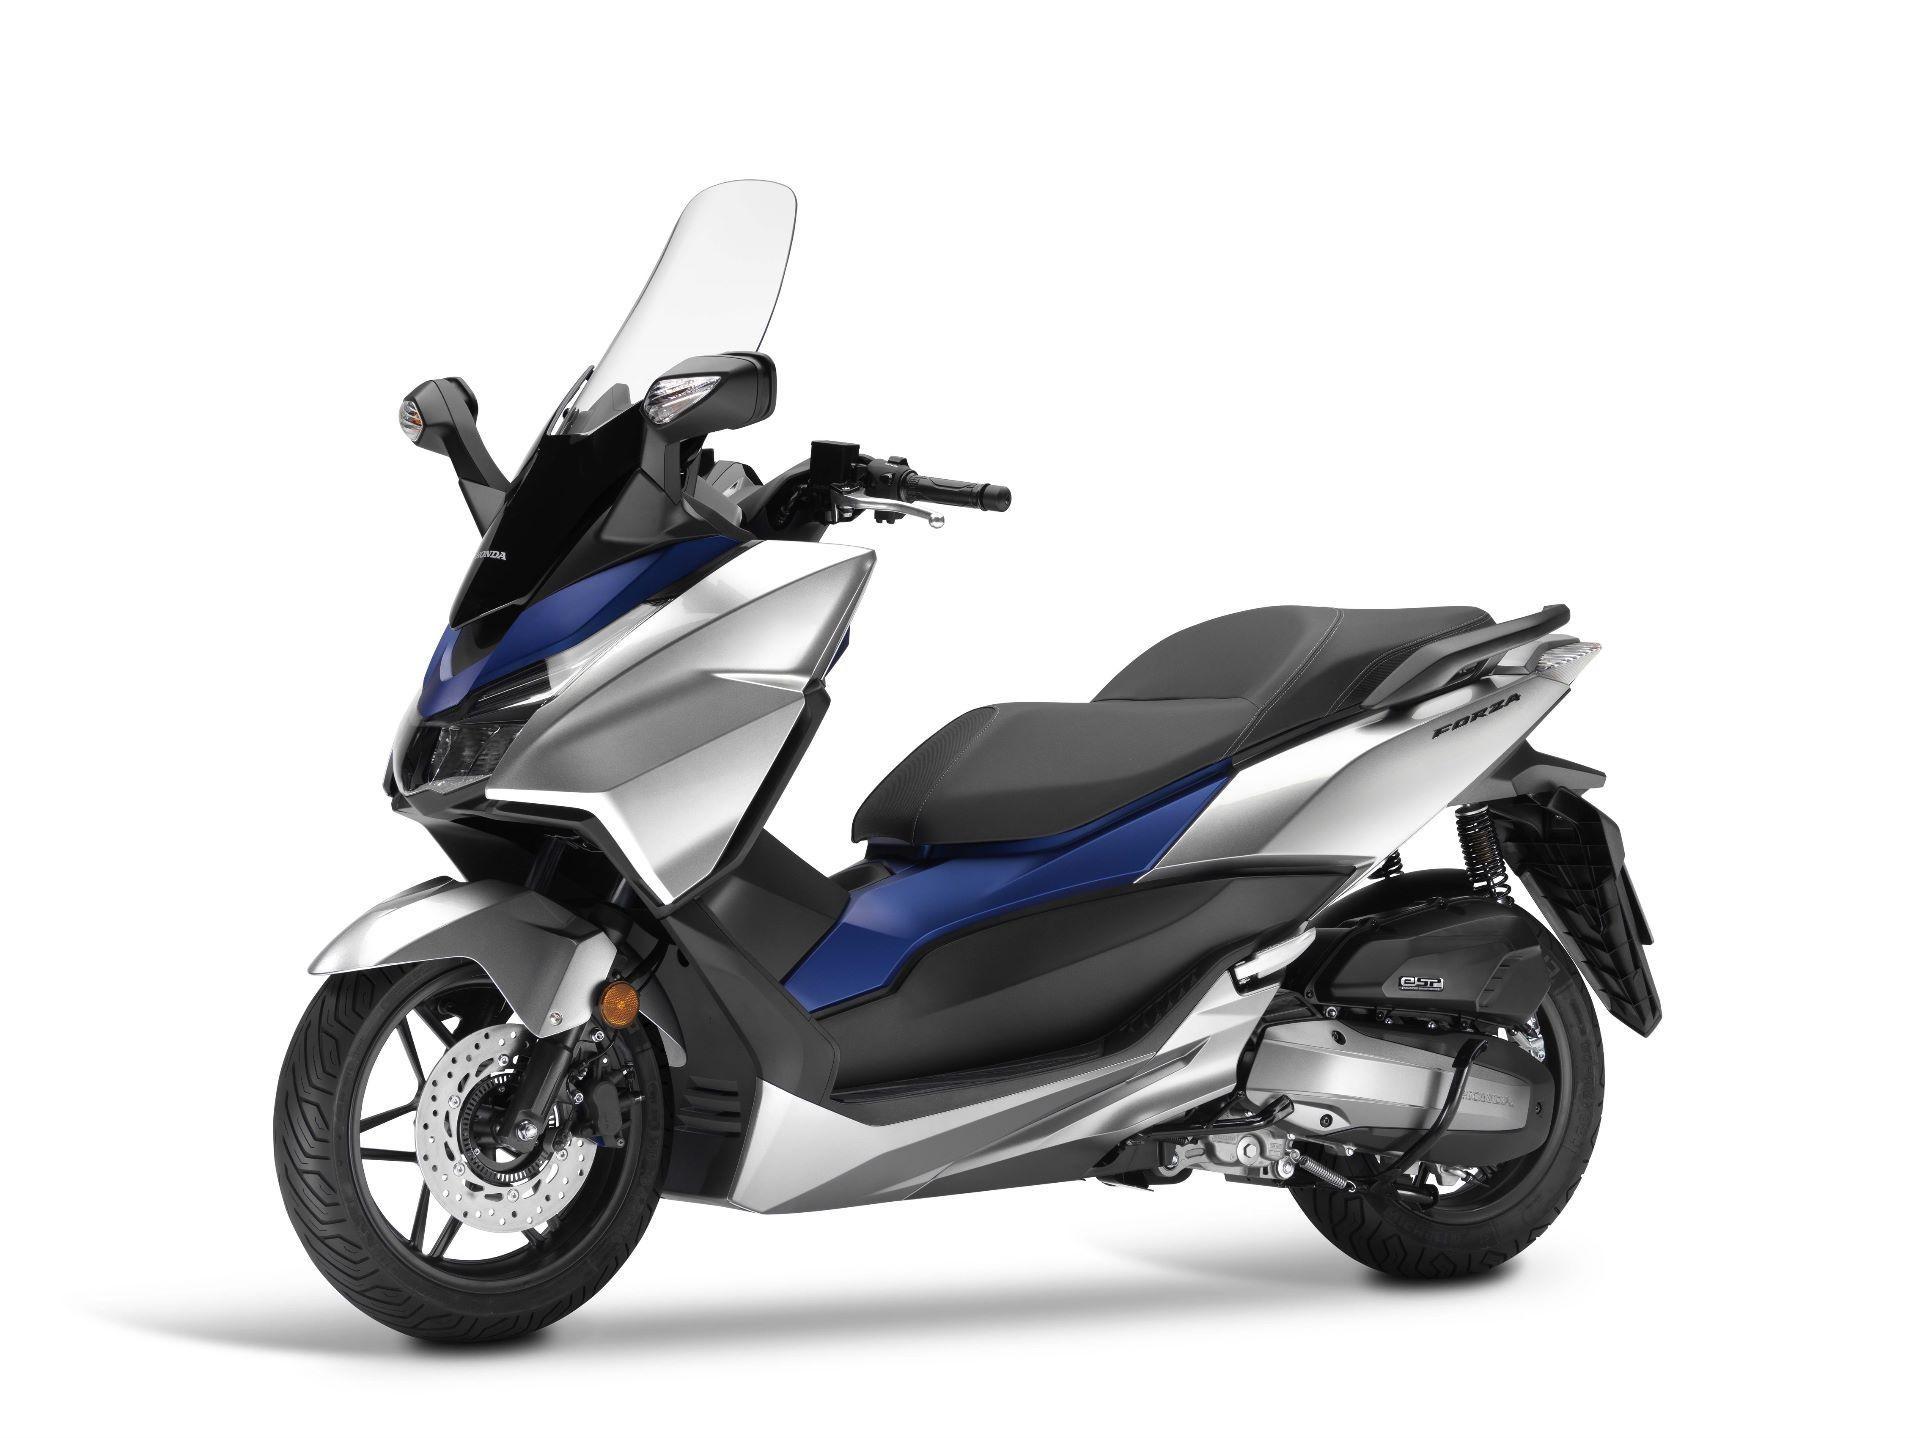 buy motorbike new vehicle bike honda nss 125 ad forza abs. Black Bedroom Furniture Sets. Home Design Ideas